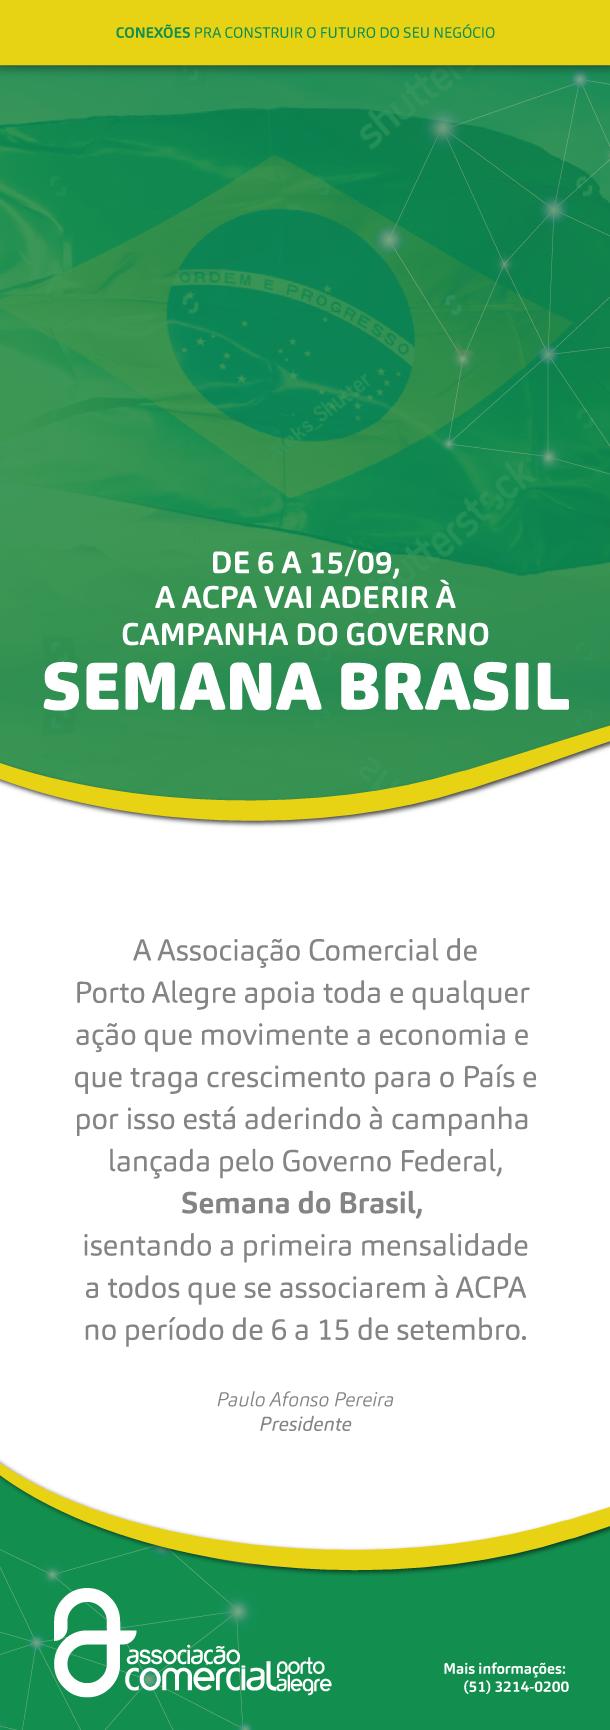 AC-0093-19---SEMANA-BRASIL-emkt